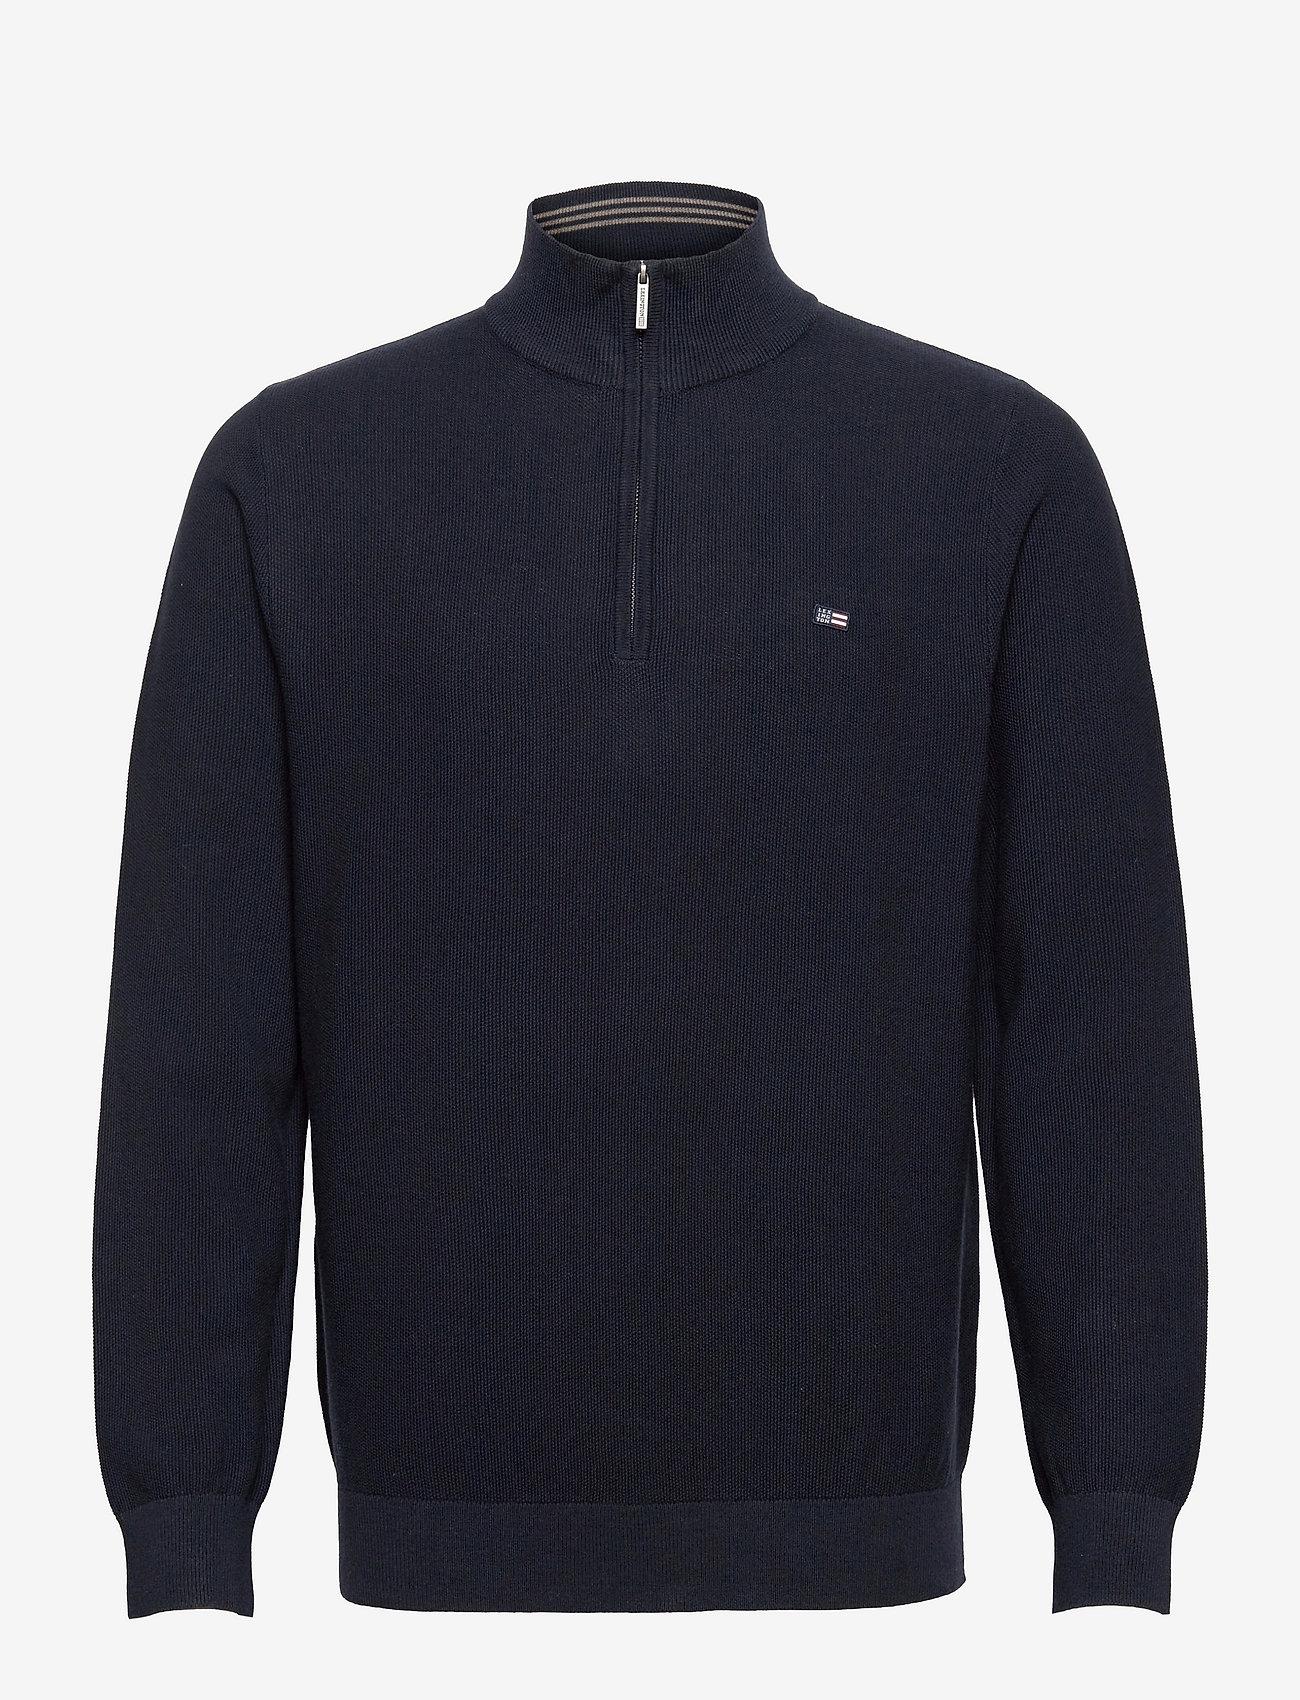 Lexington Clothing - Clay Organic Cotton Half Zip Sweater - truien met halve rits - dark blue - 1